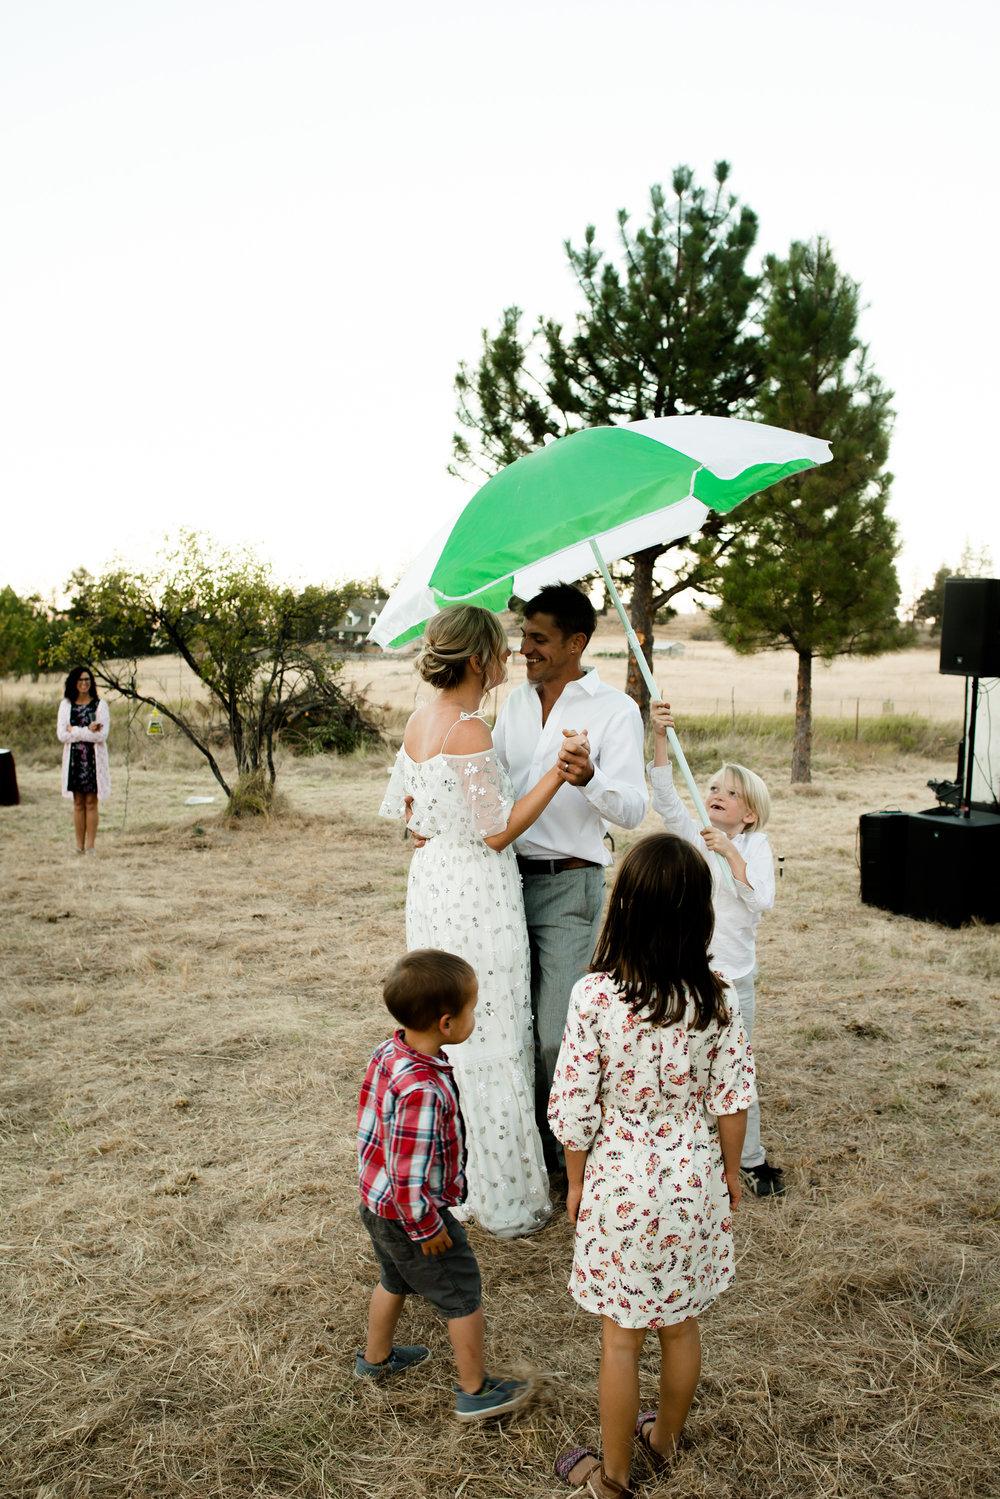 Lana Micah Wedding La Grande Oregon September 2018 Please Credit Talia Jean Galvin (496 of 687).jpg